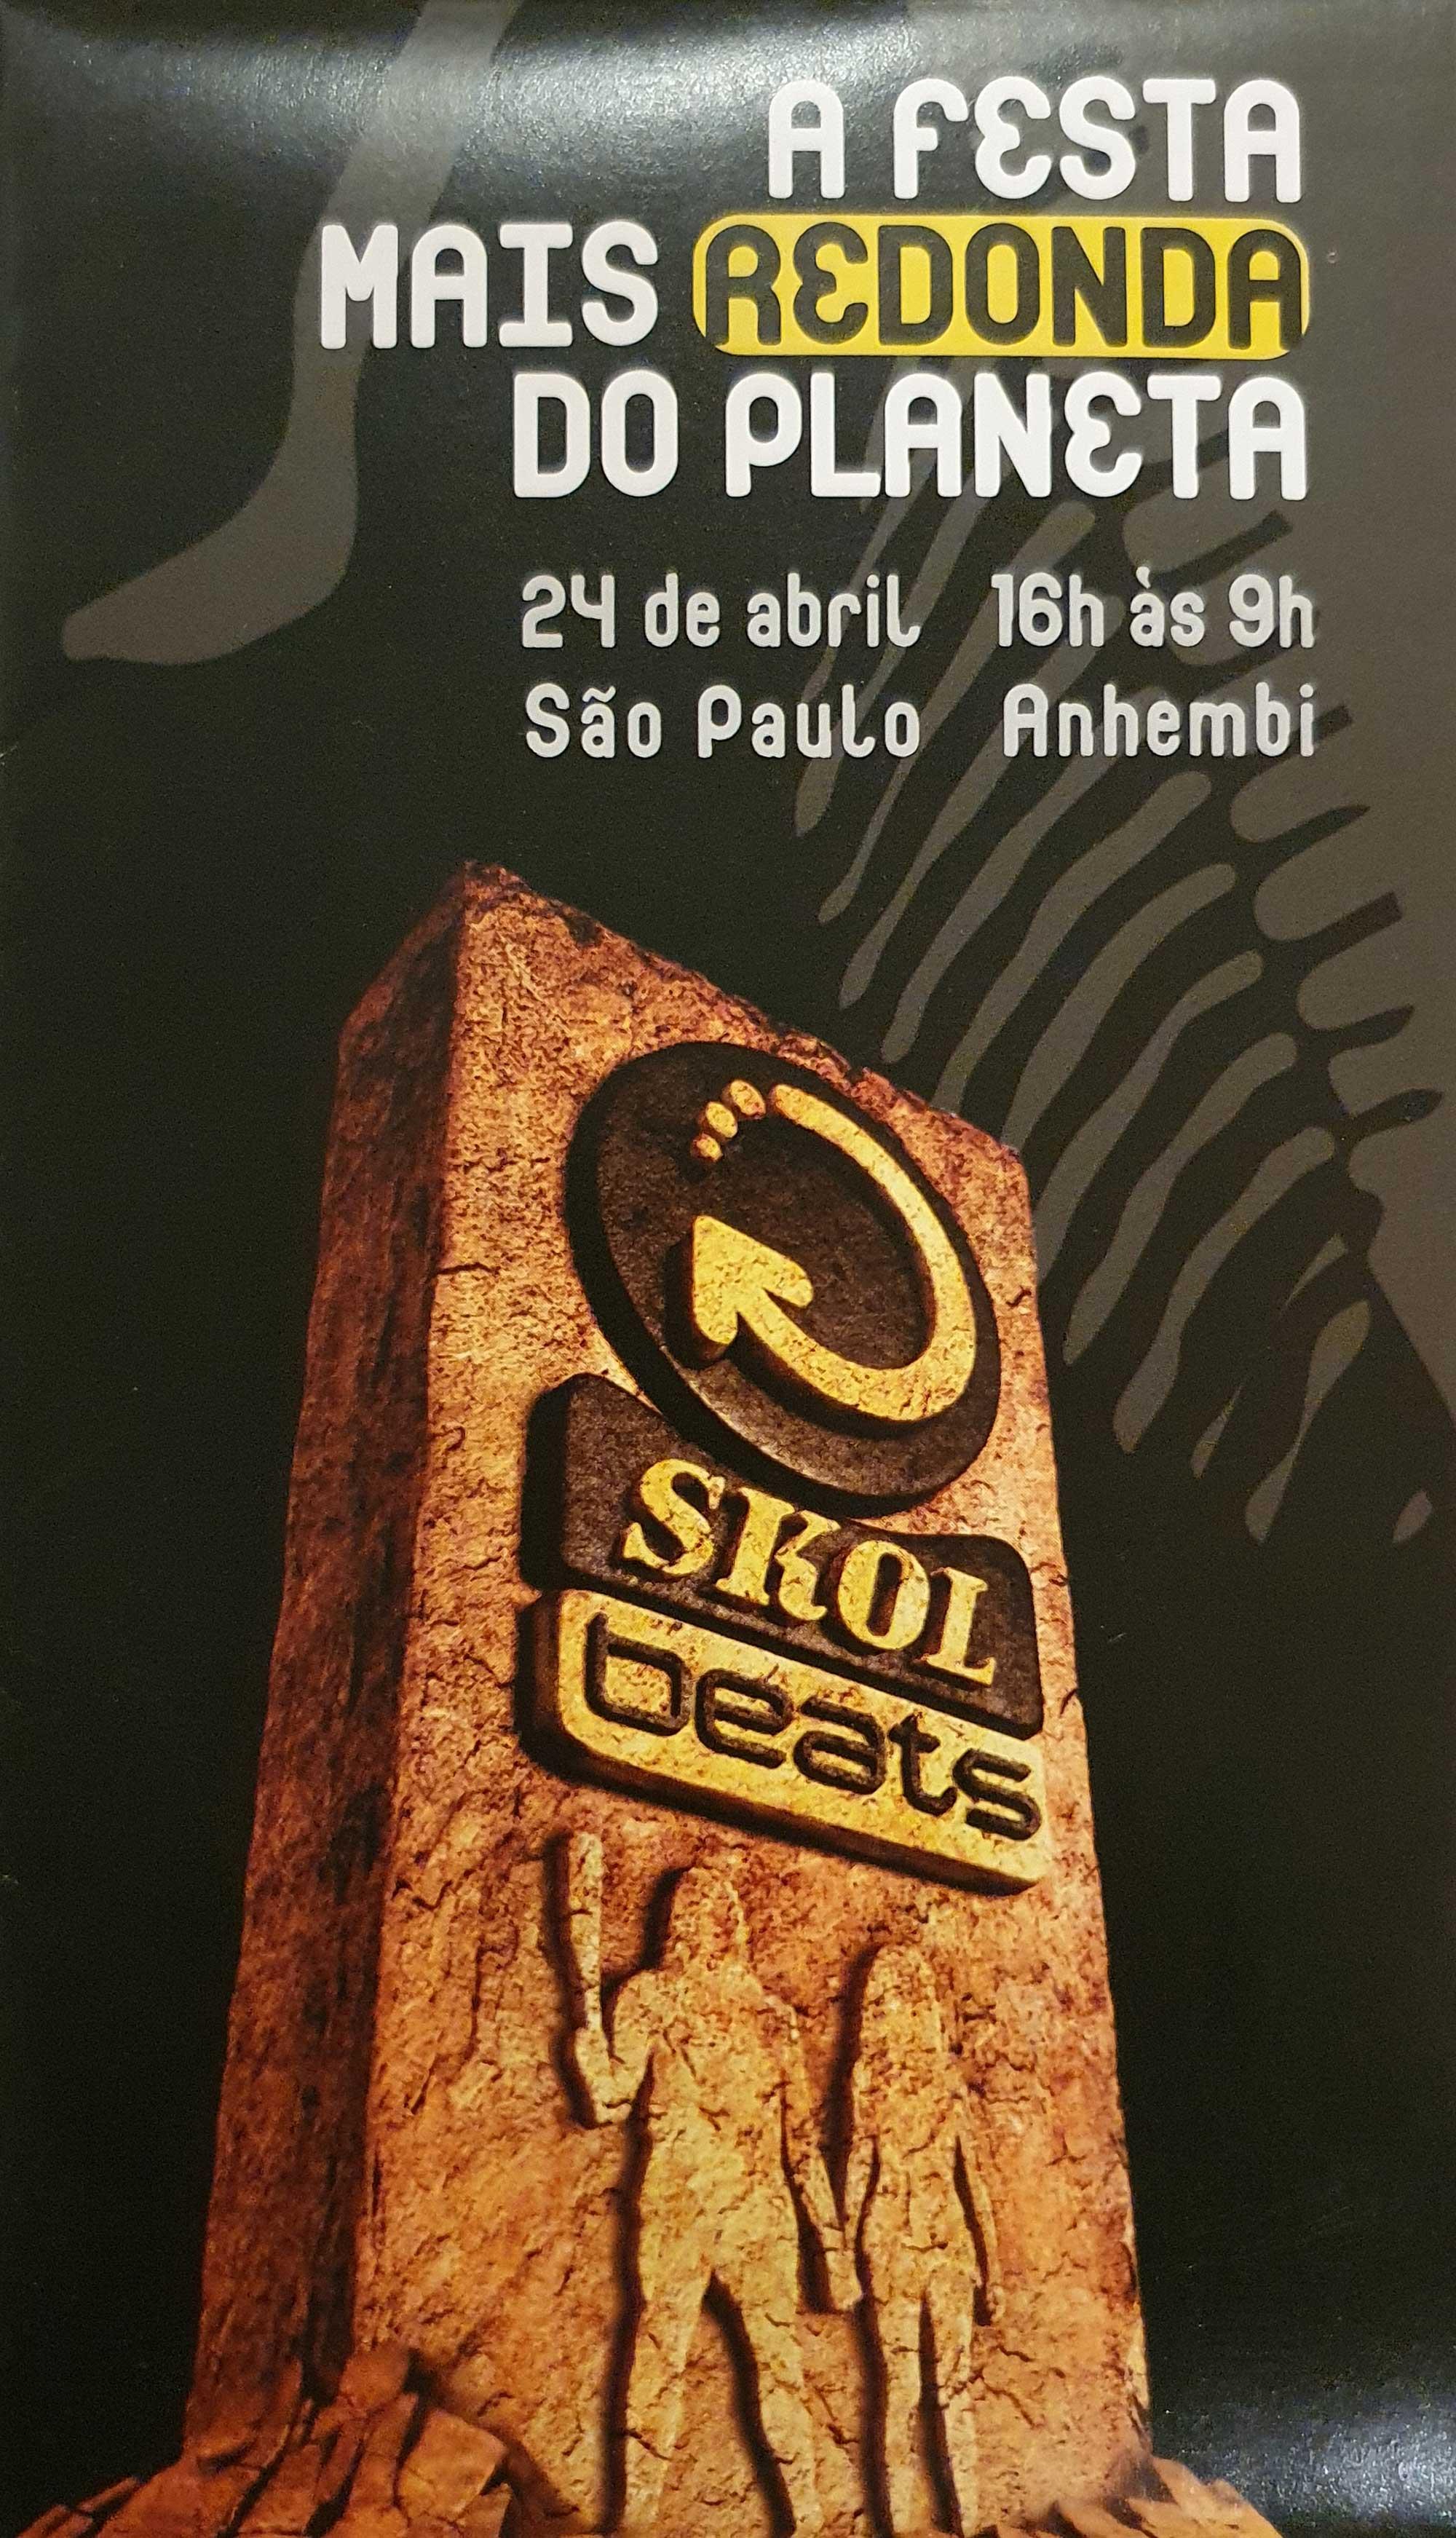 skol-beats-2